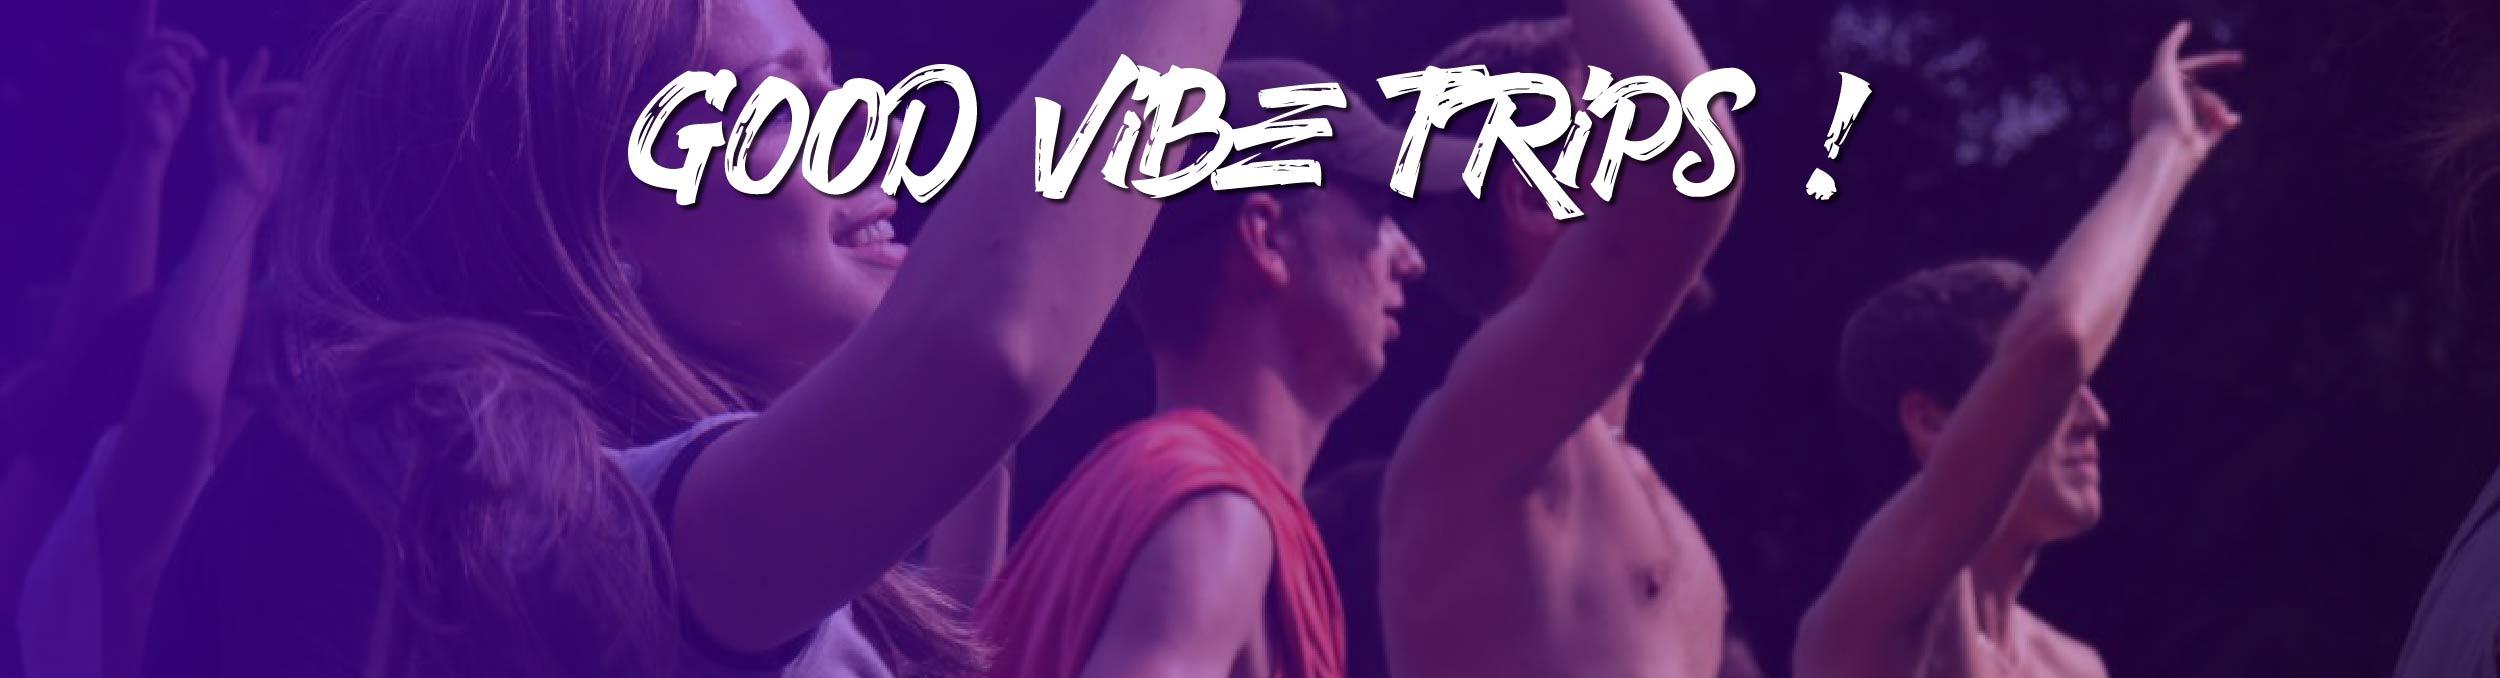 good-vibe-trips-01